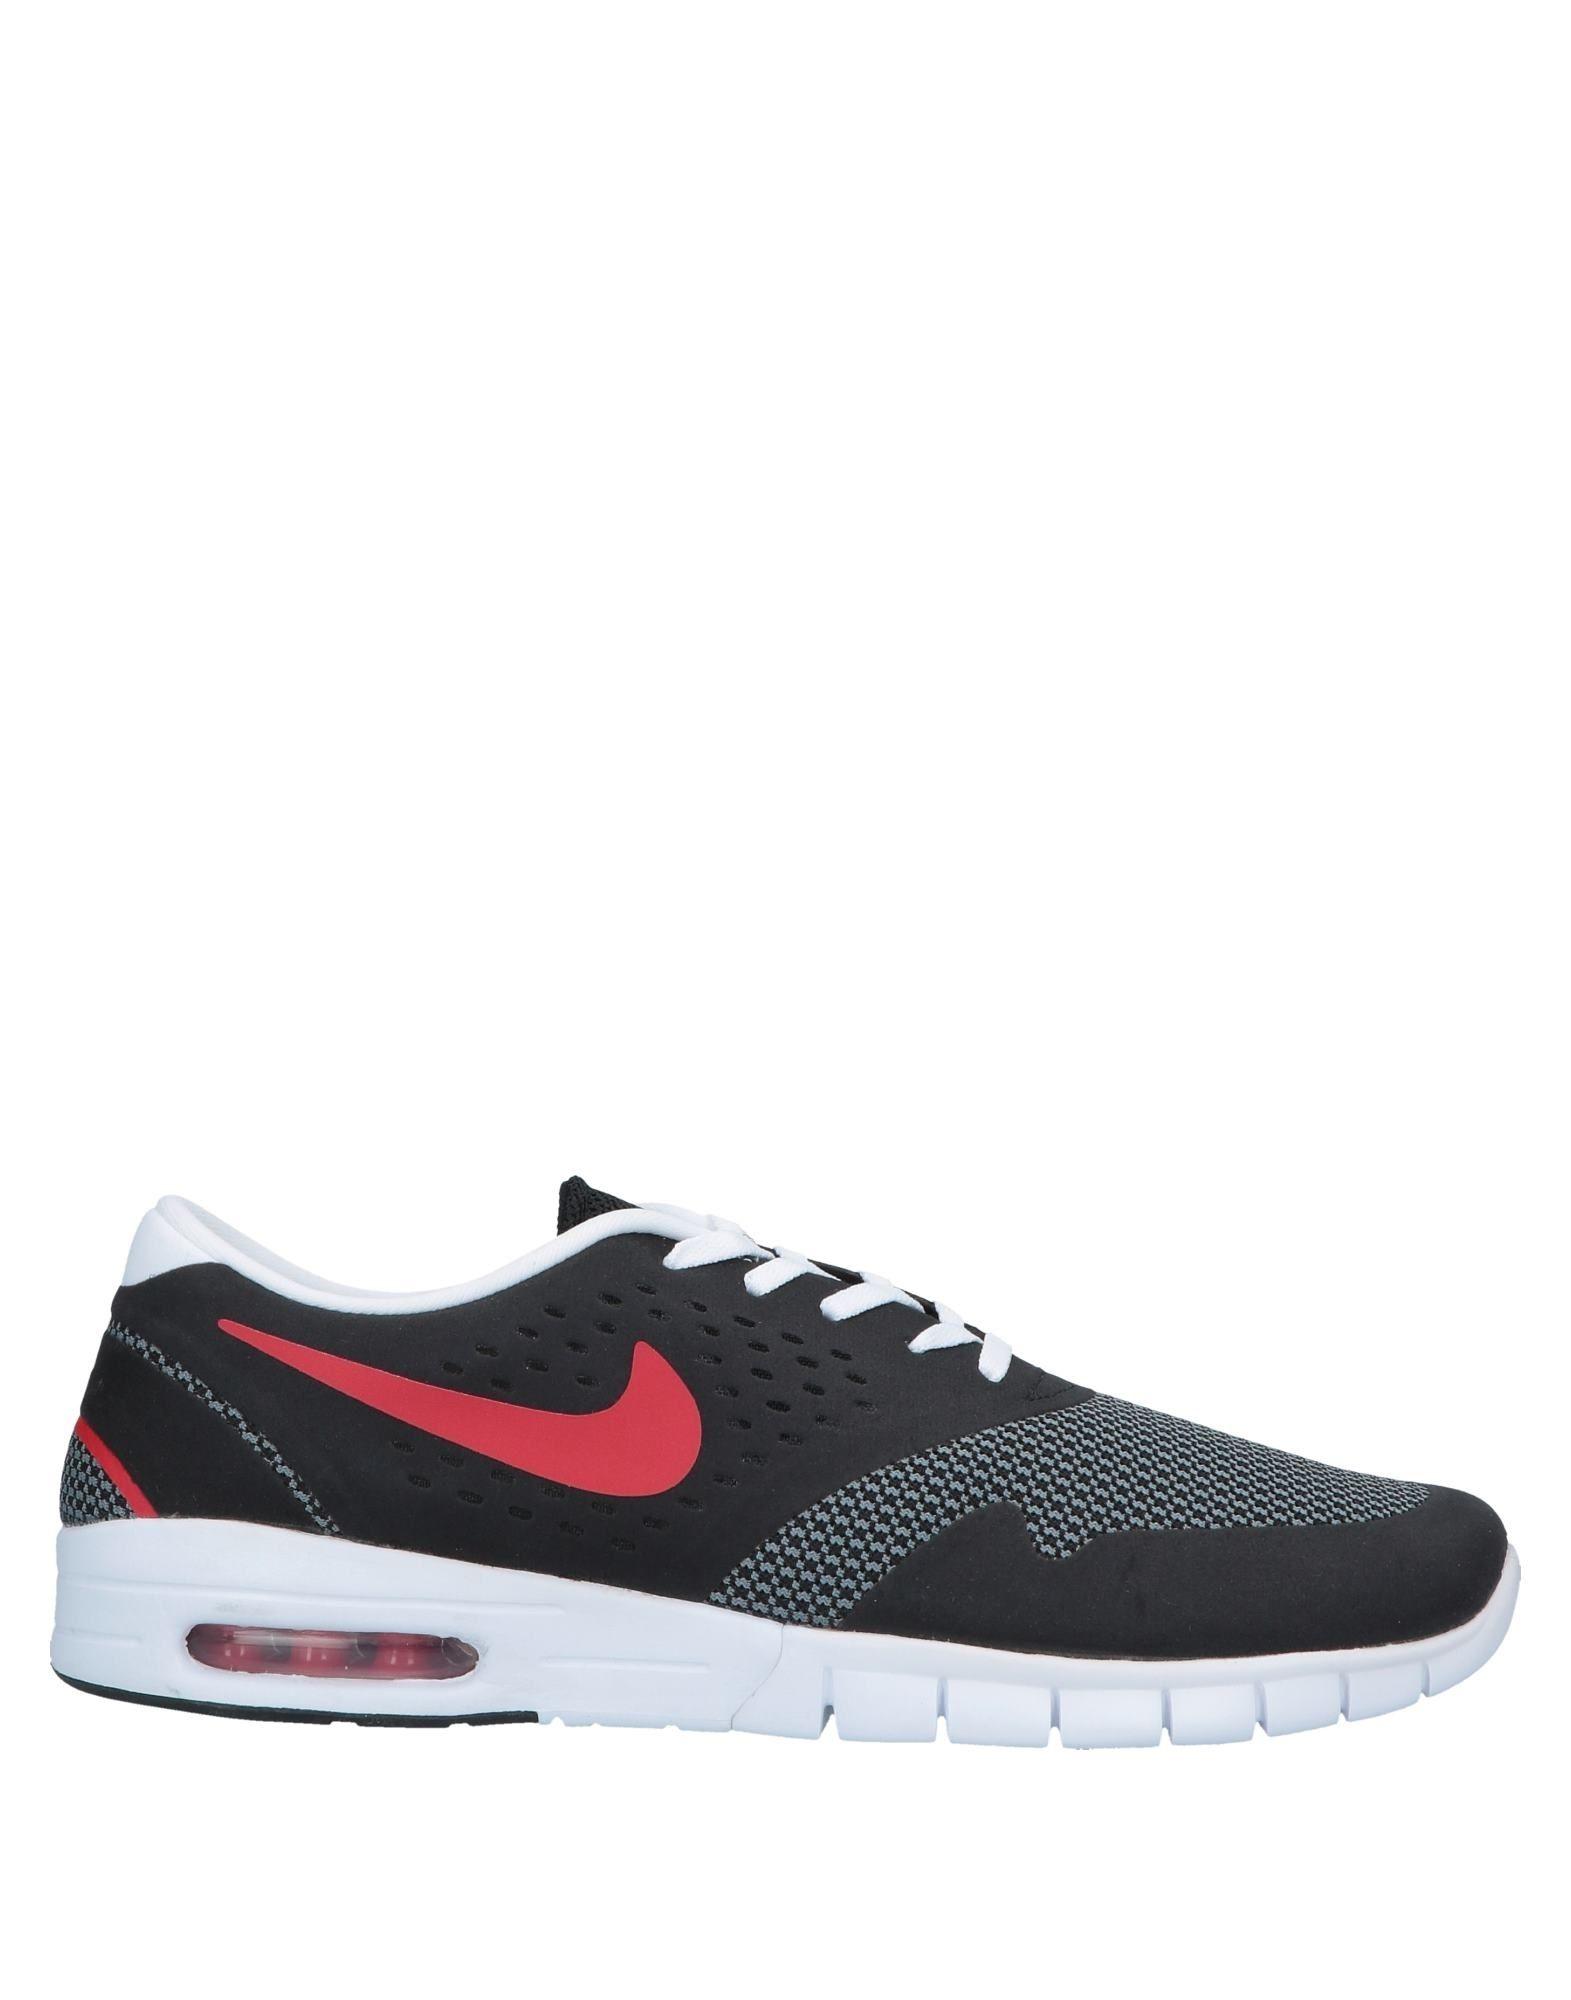 Turnschuhe Nike Sb Collection herren - 11652194OD